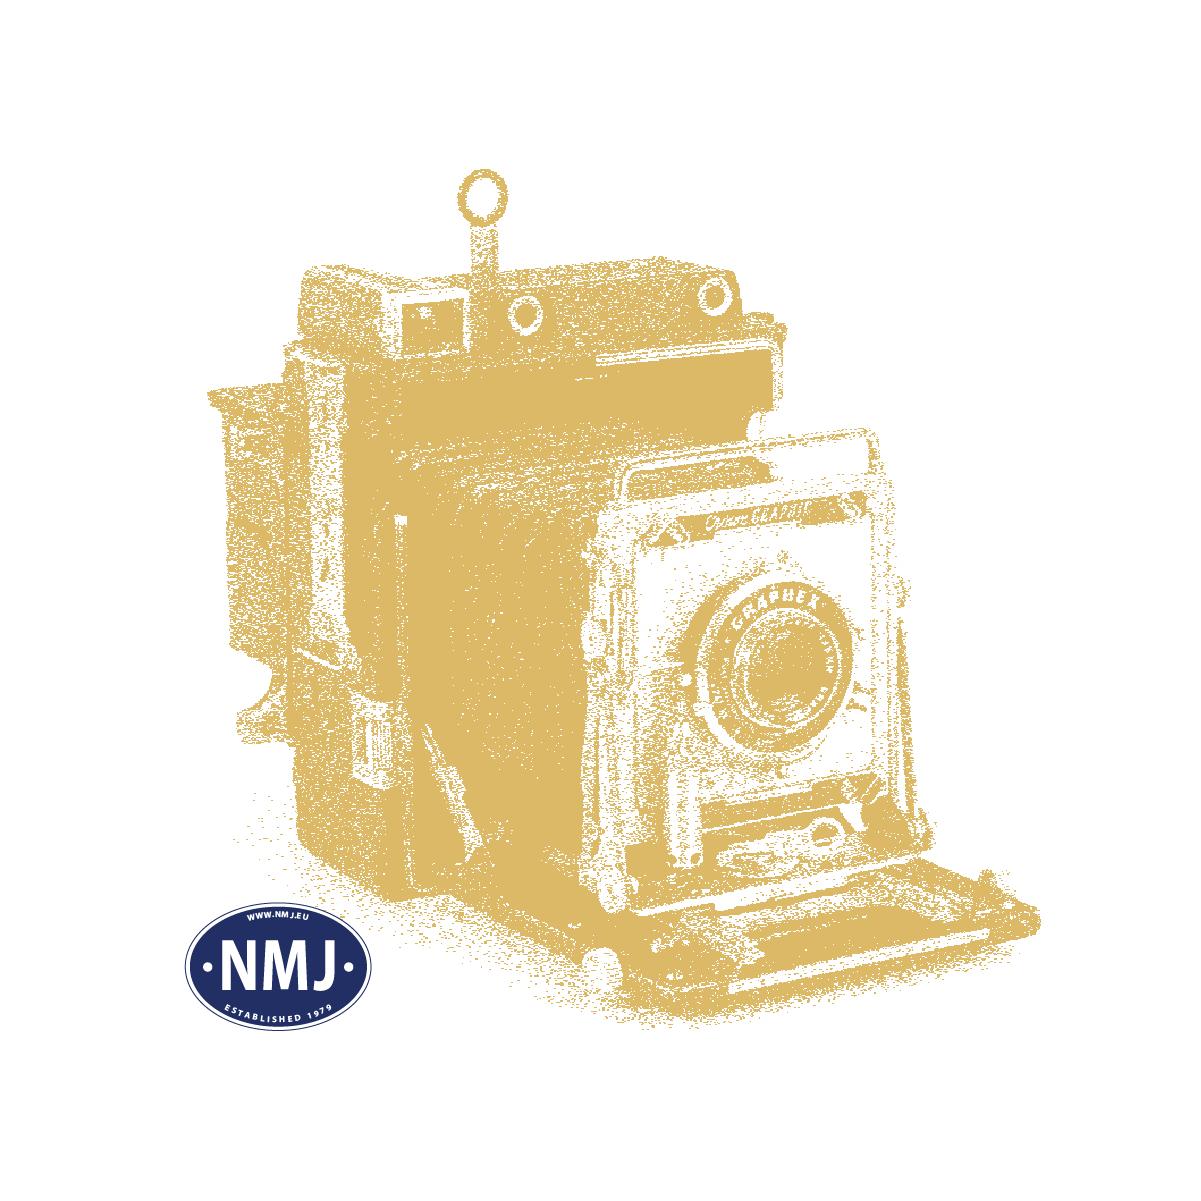 NMJSTl35754 - NMJ Superline NSB Stakevogn Tl3 5754 m/ Sidelemmer